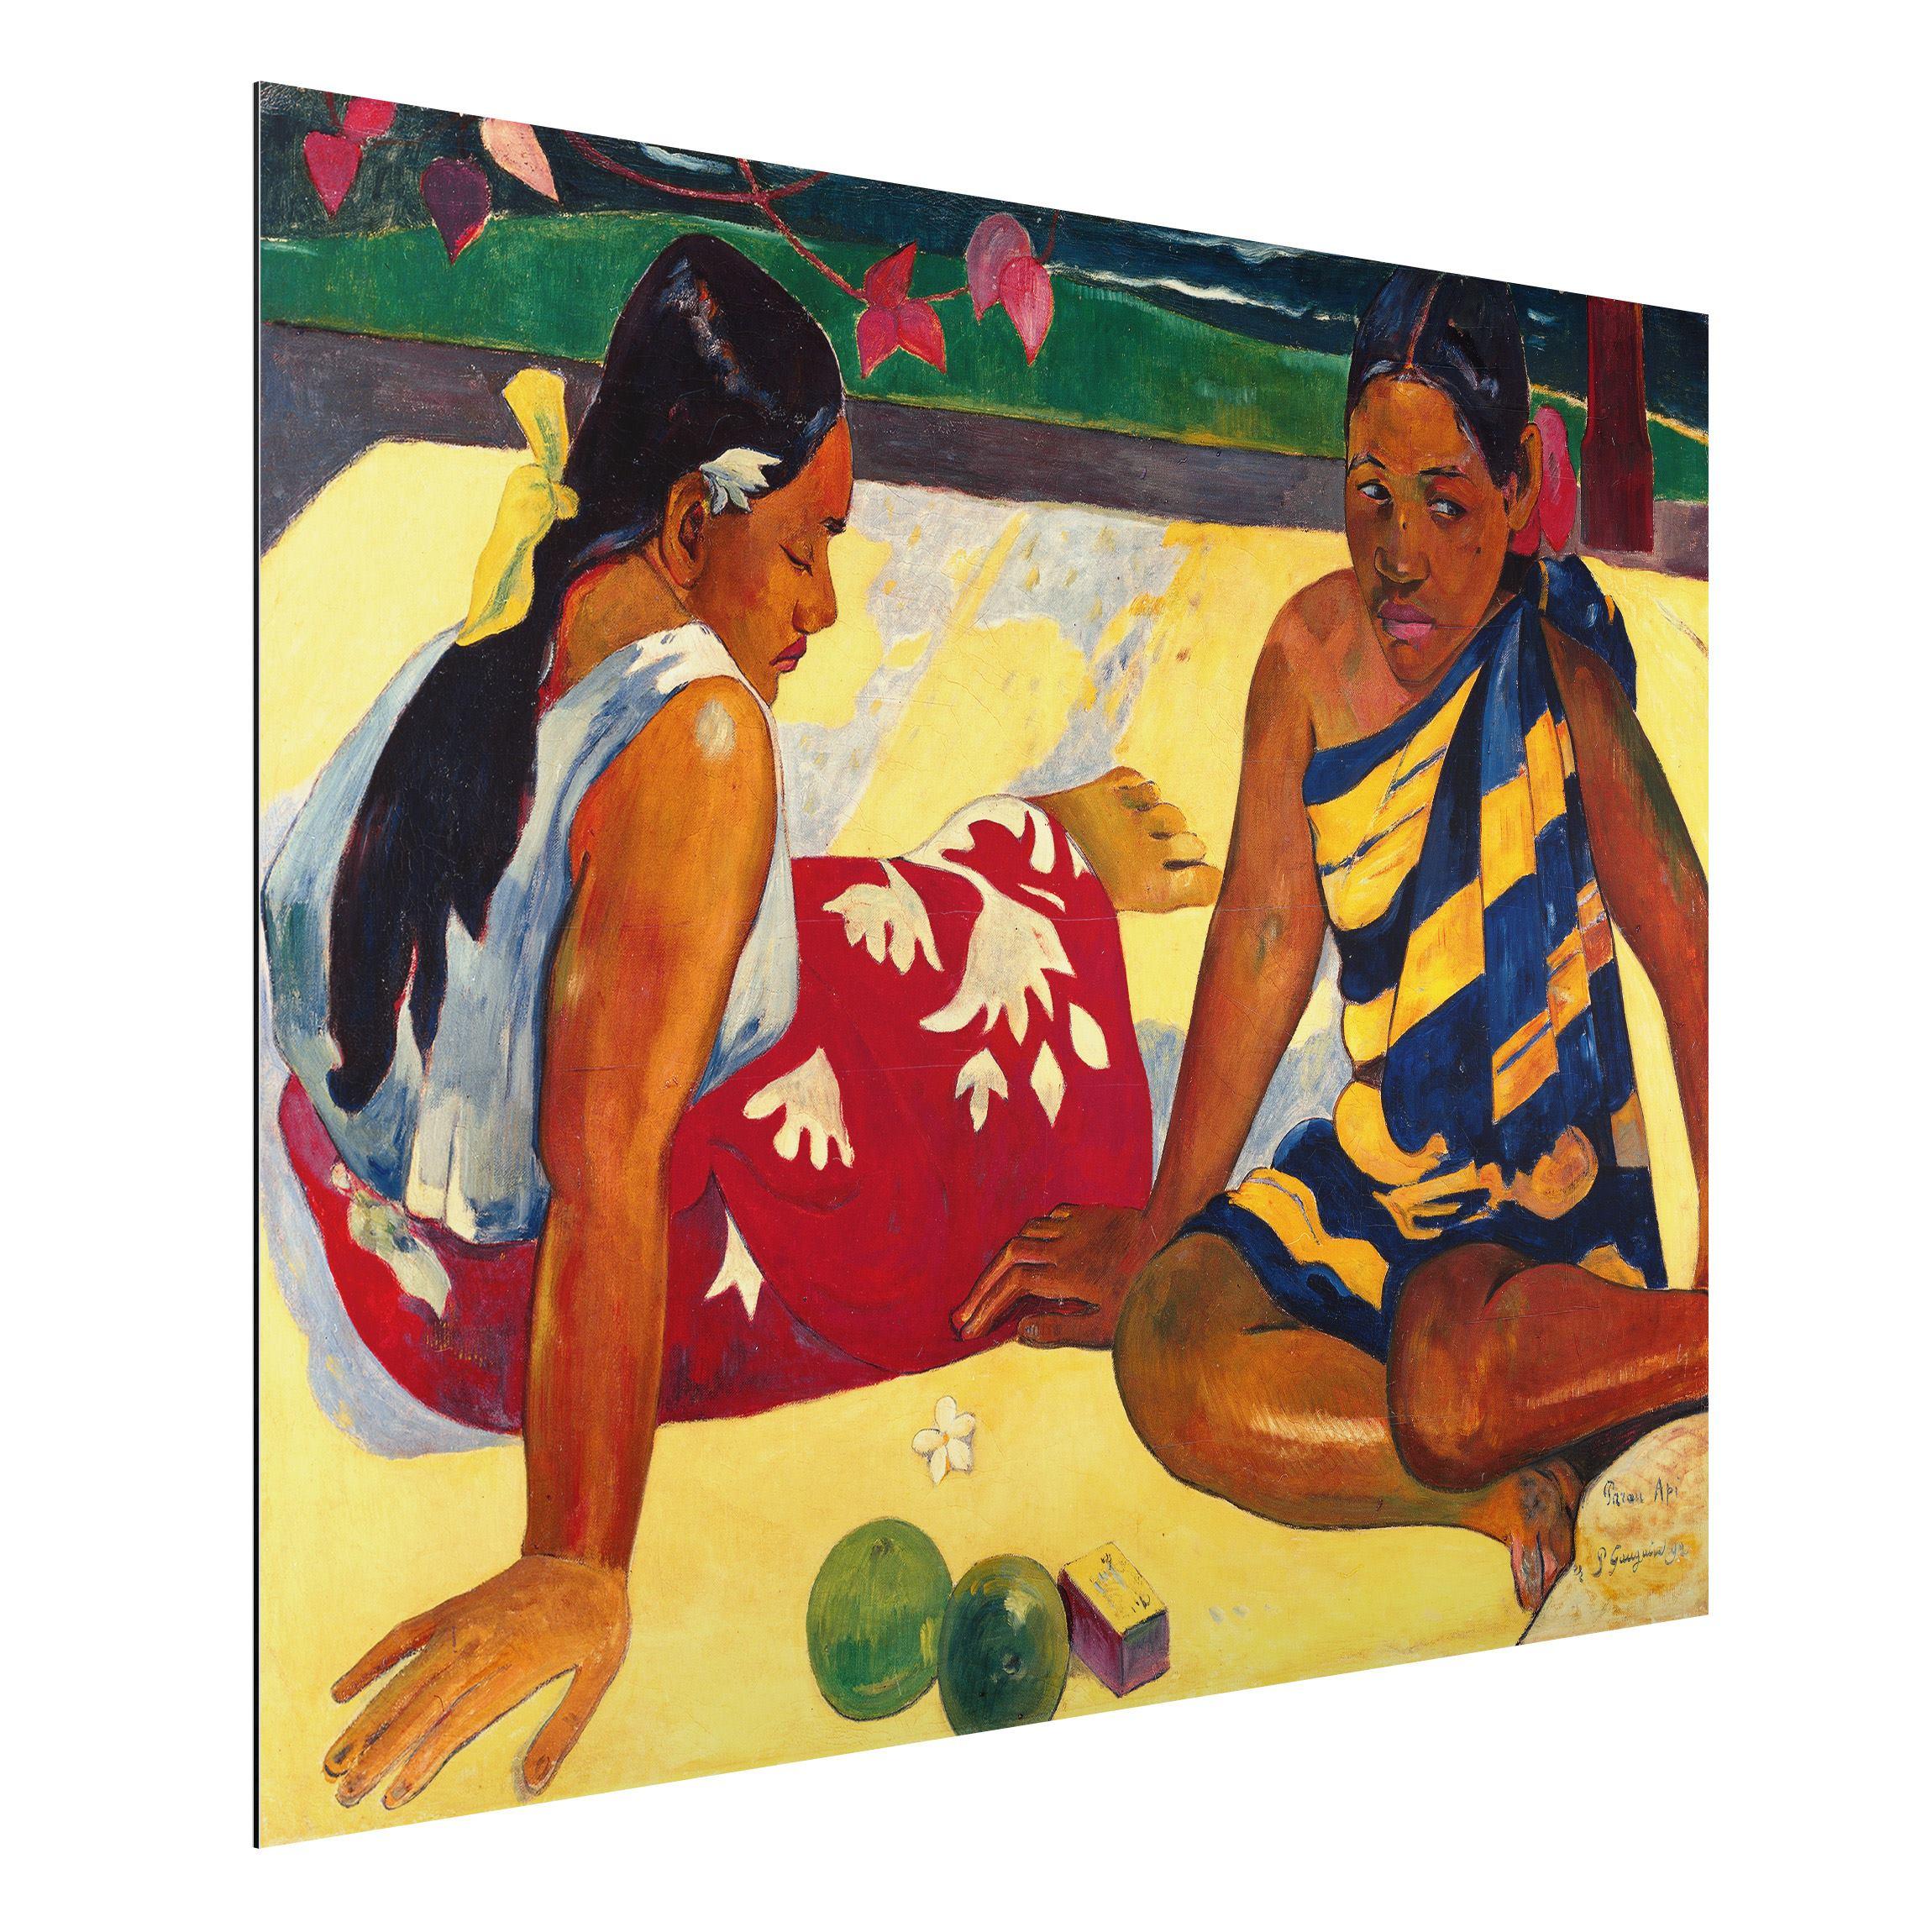 Paul Gauguin: Ruperupe. Kunstdruck, Leinwandbild